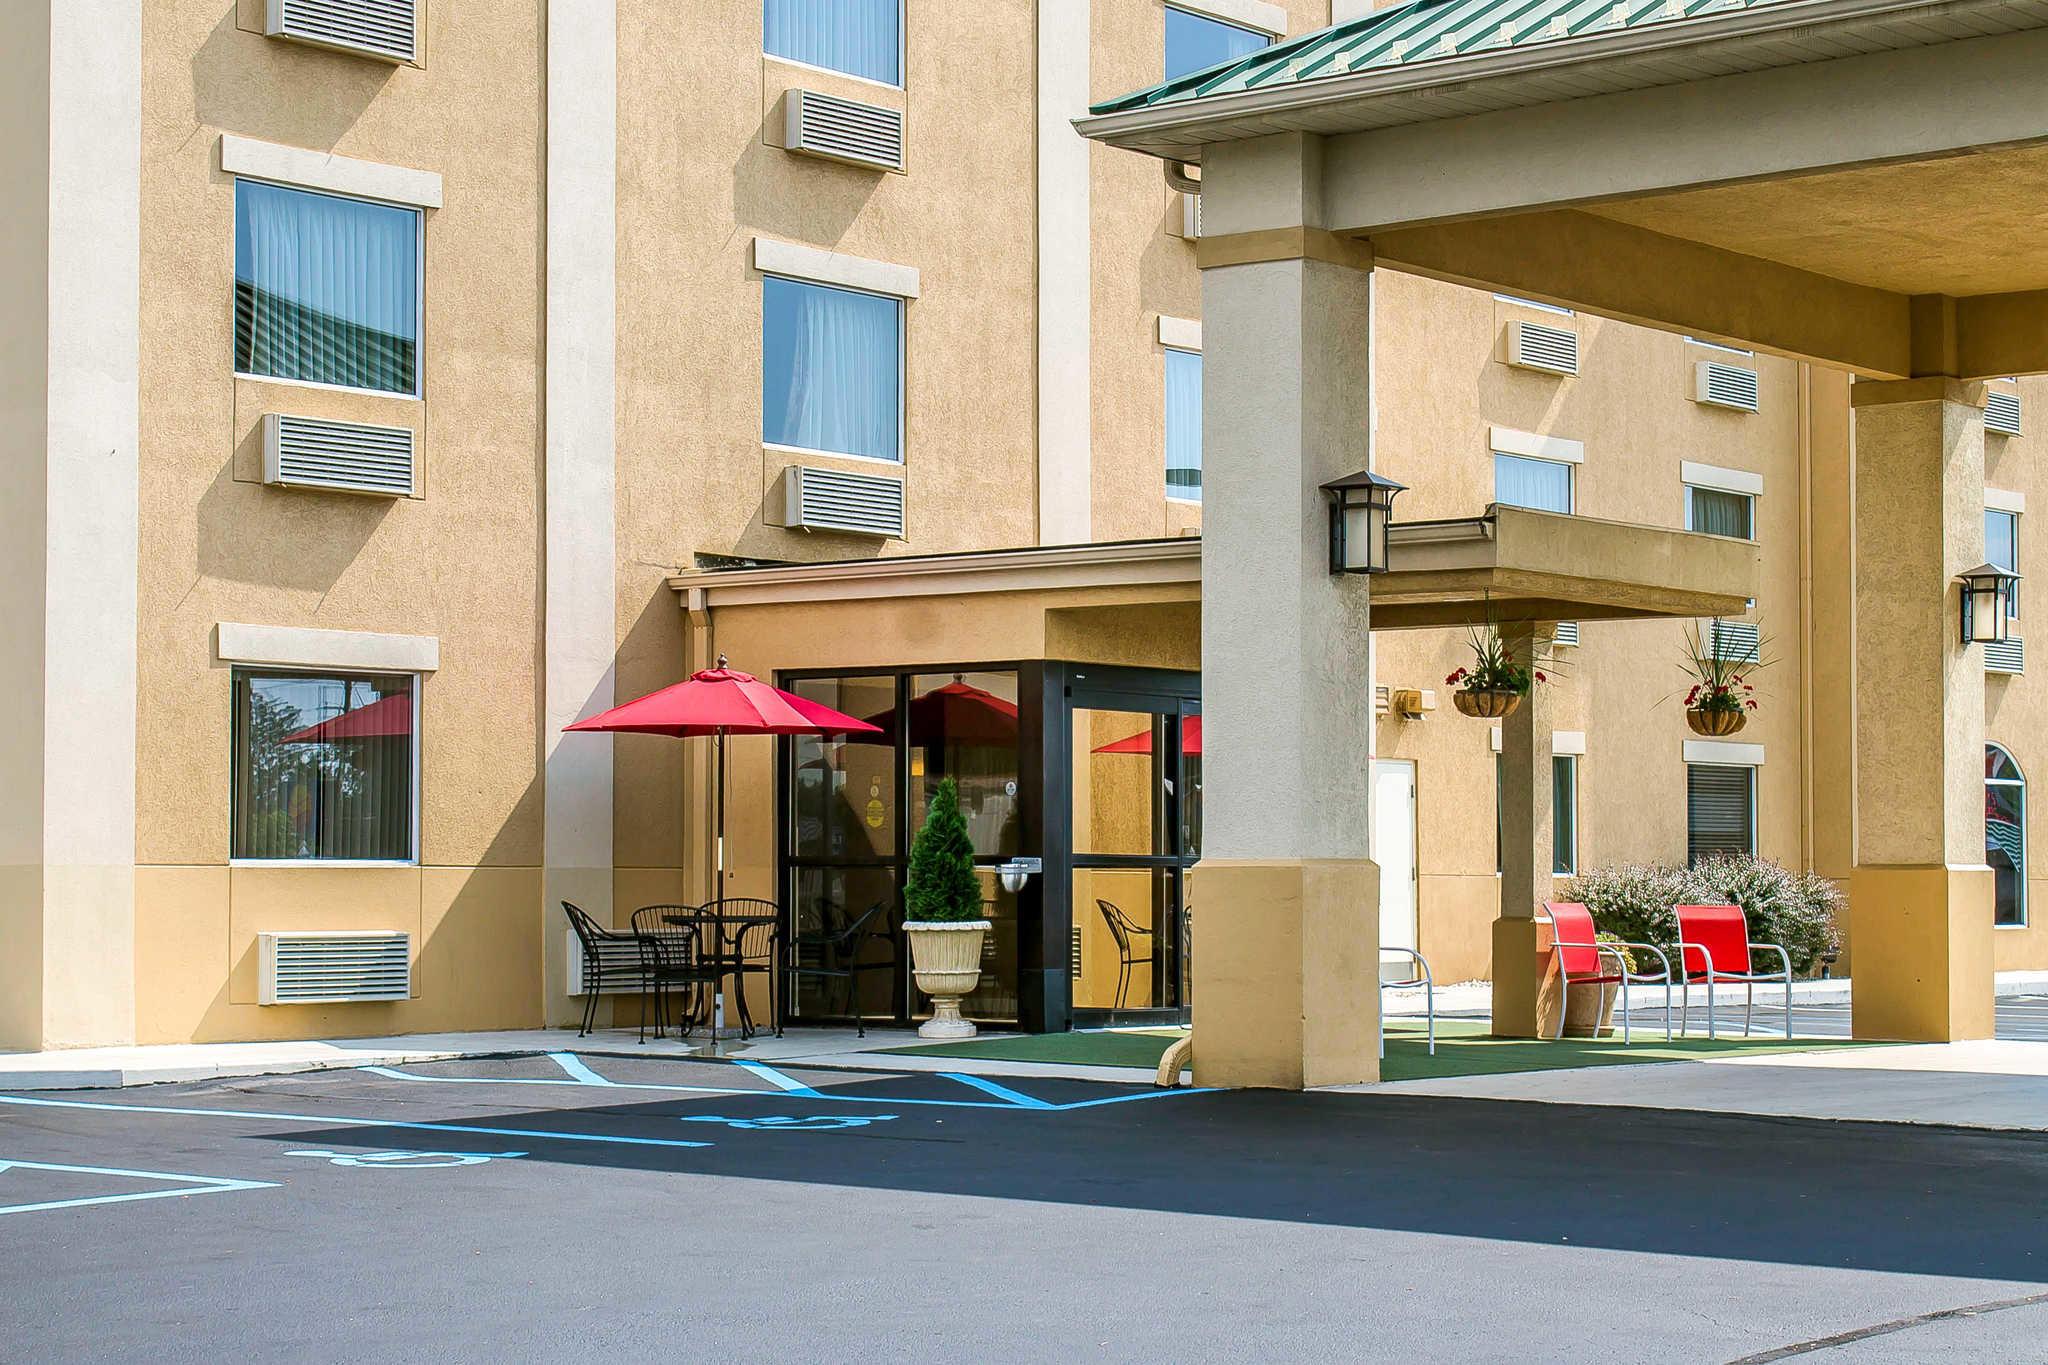 Comfort Inn & Suites image 2